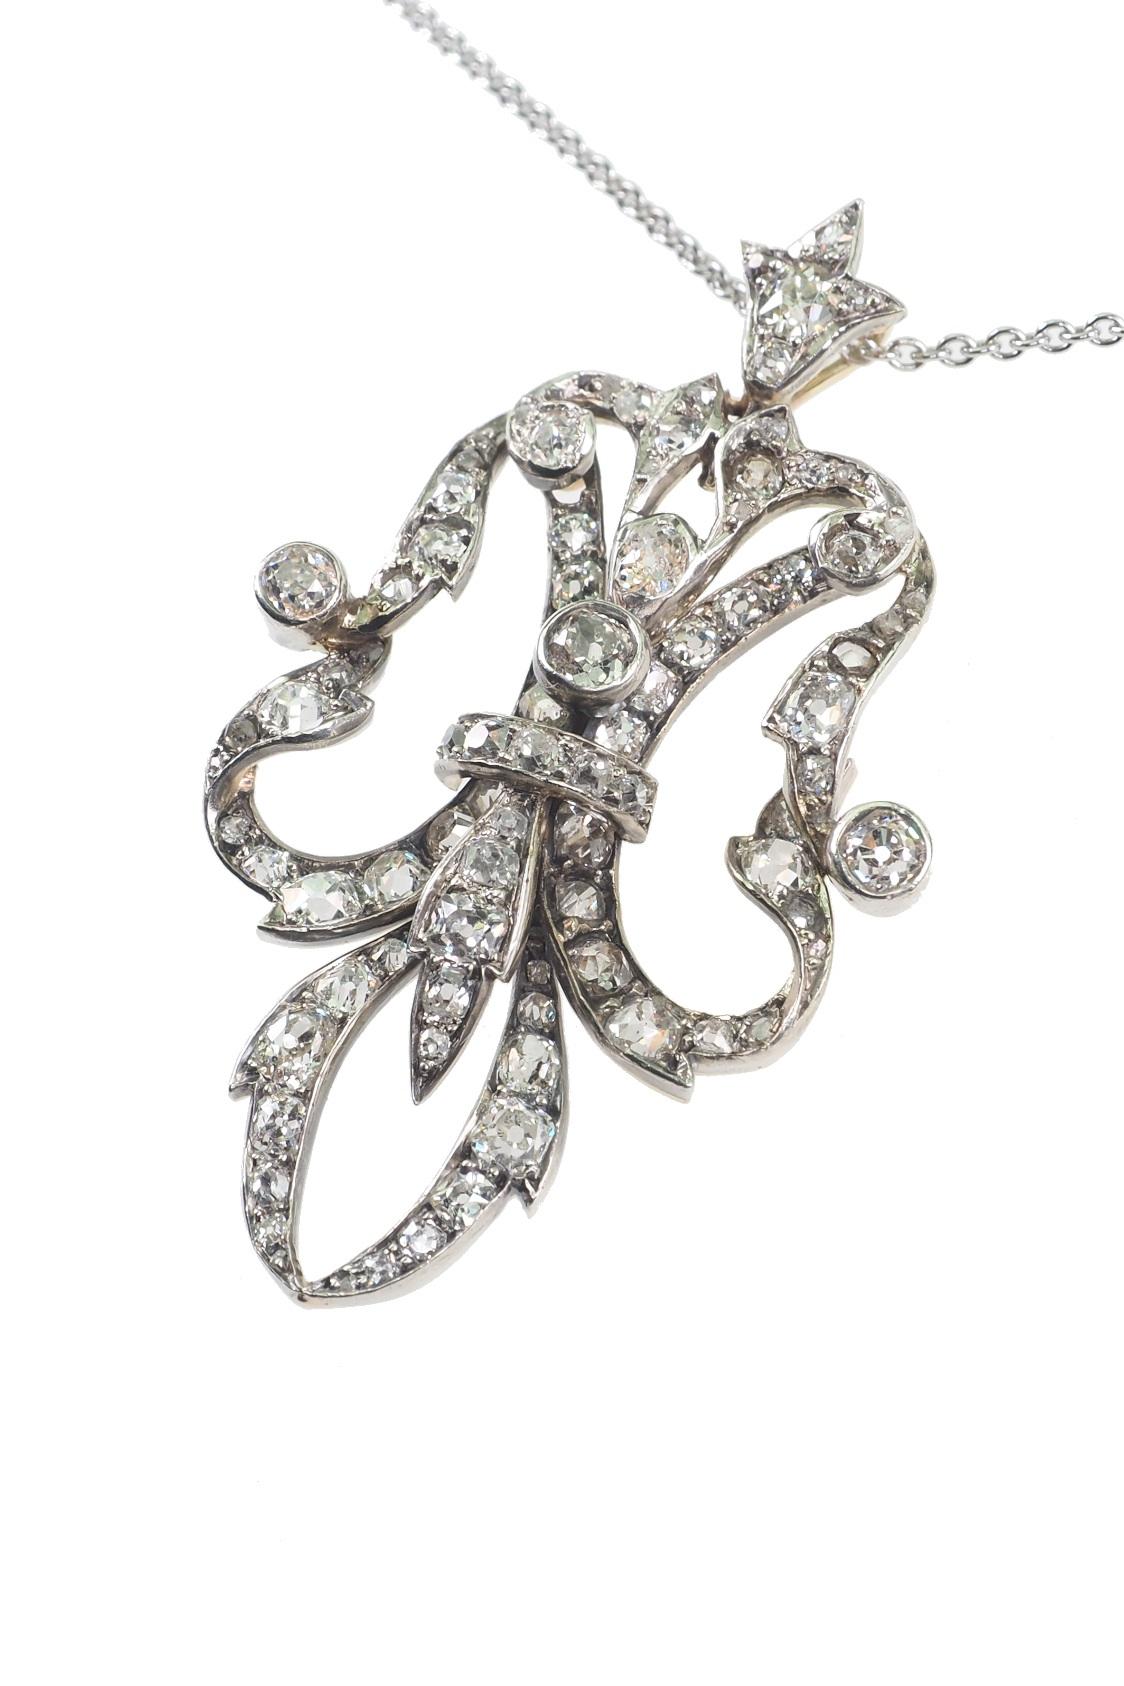 antike-Diamantanhänger-online-0137a